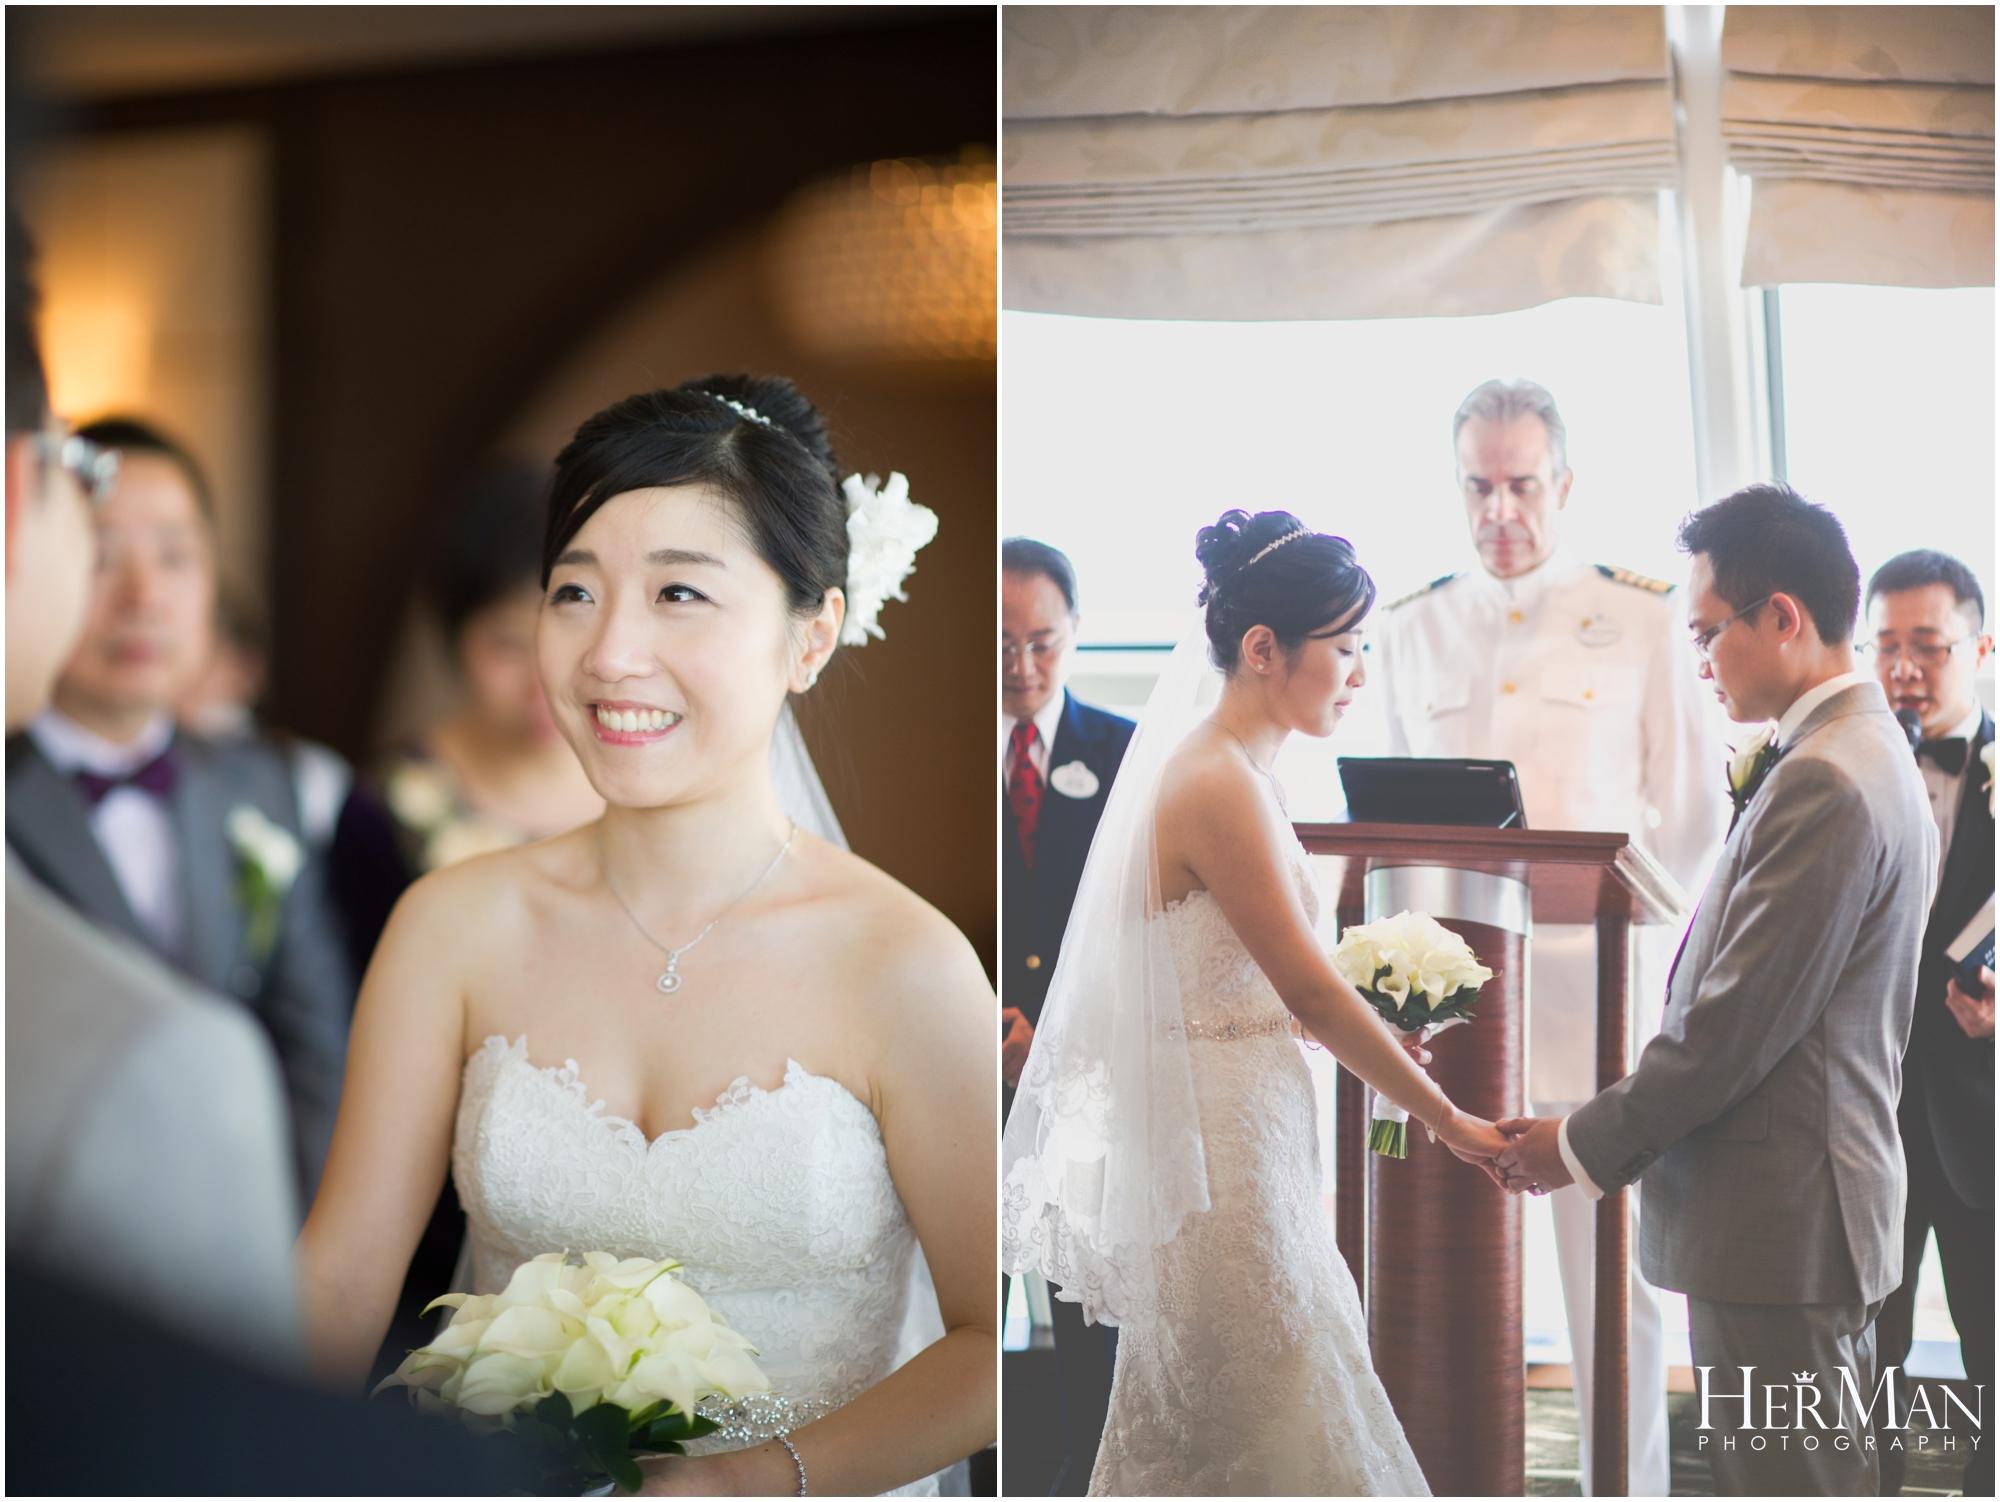 disney-fantasy-cruise-wedding-HerMan-photography_0027.jpg